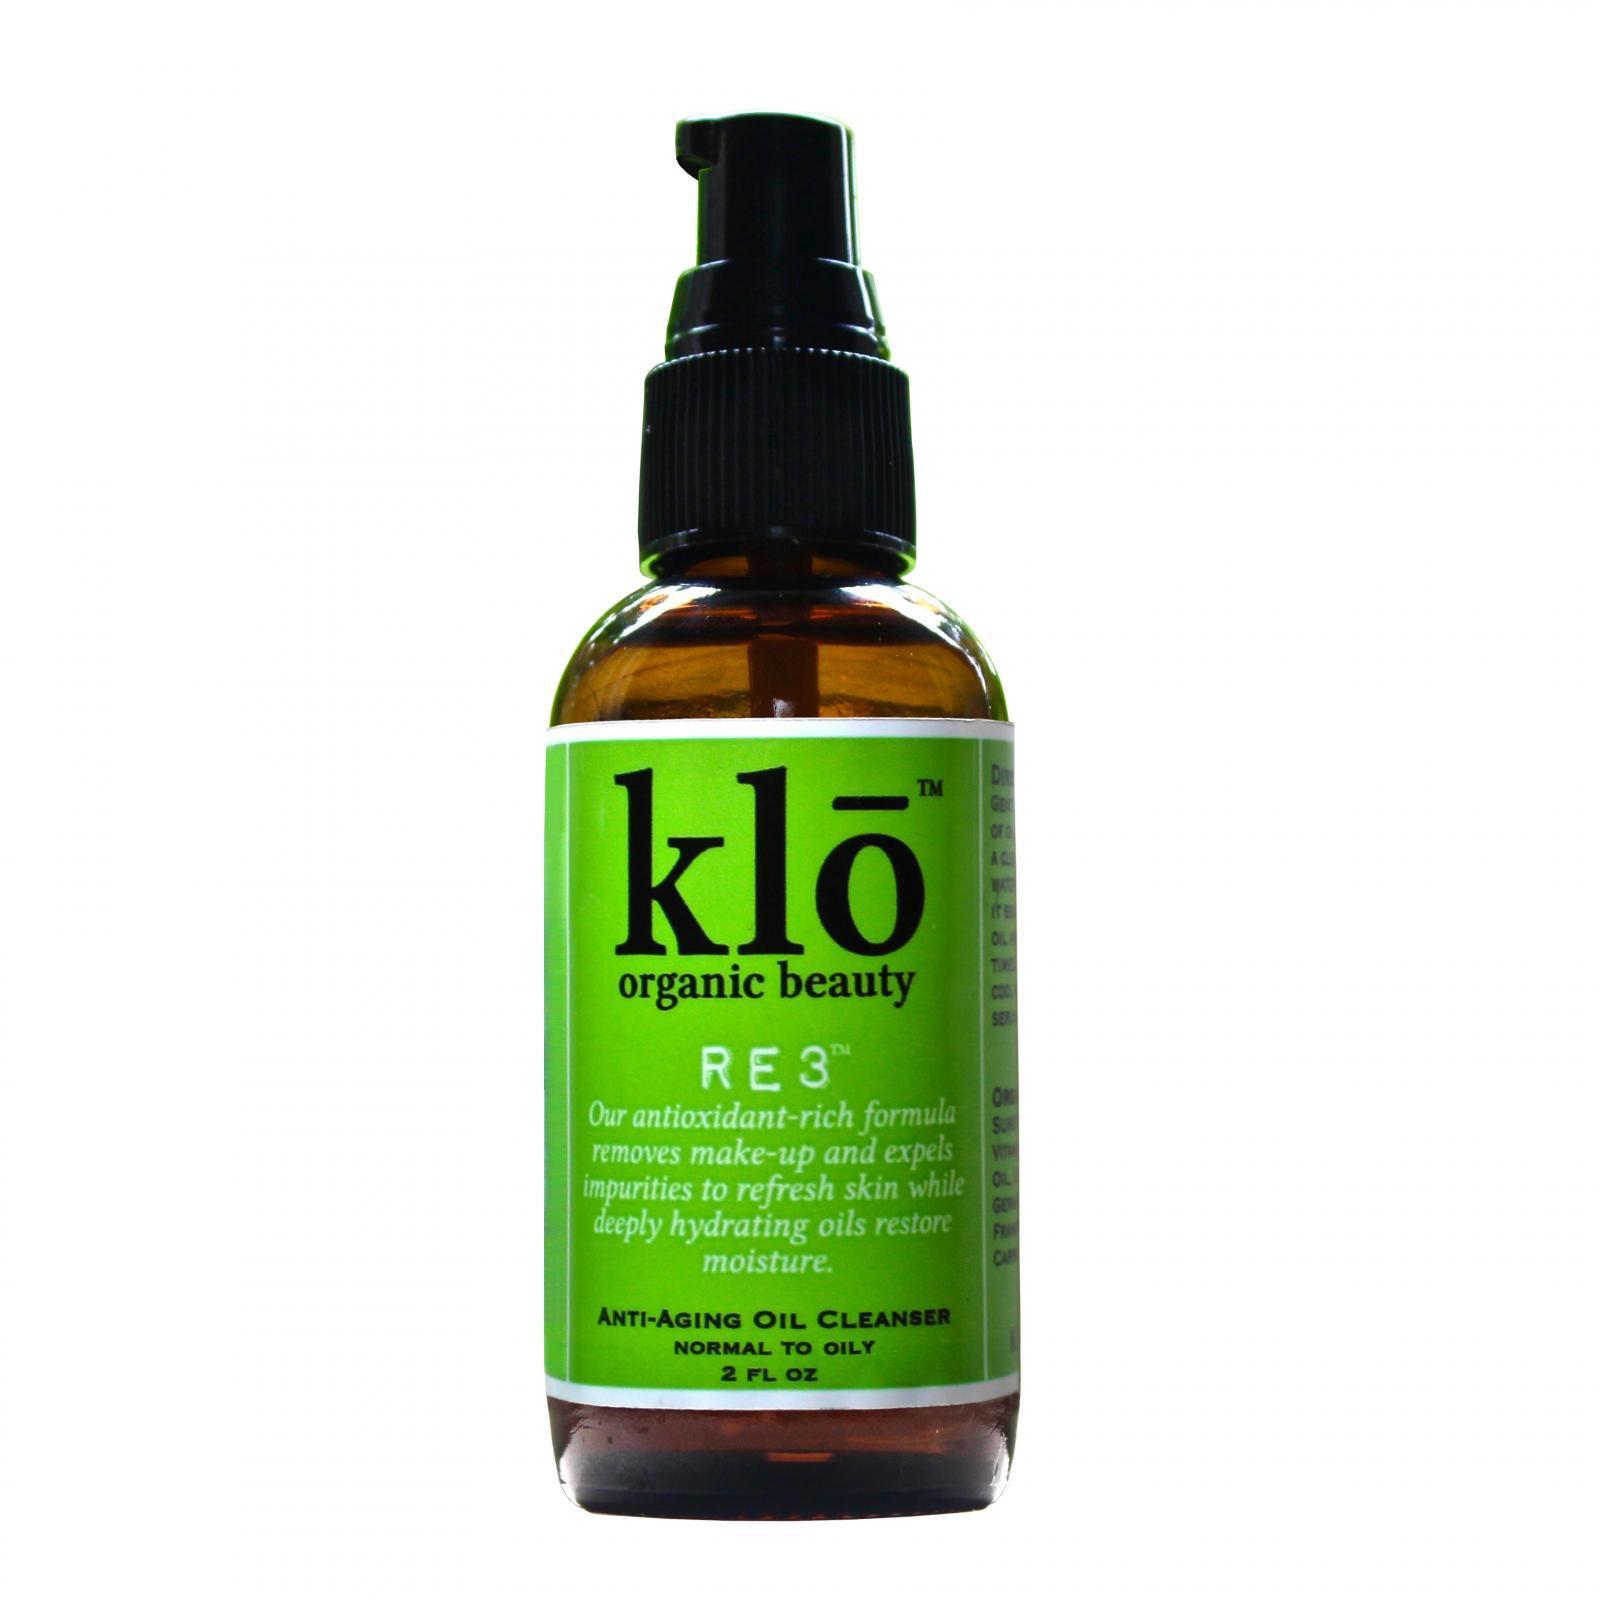 RE3 Oil Cleanser (oily/acne-prone skin)